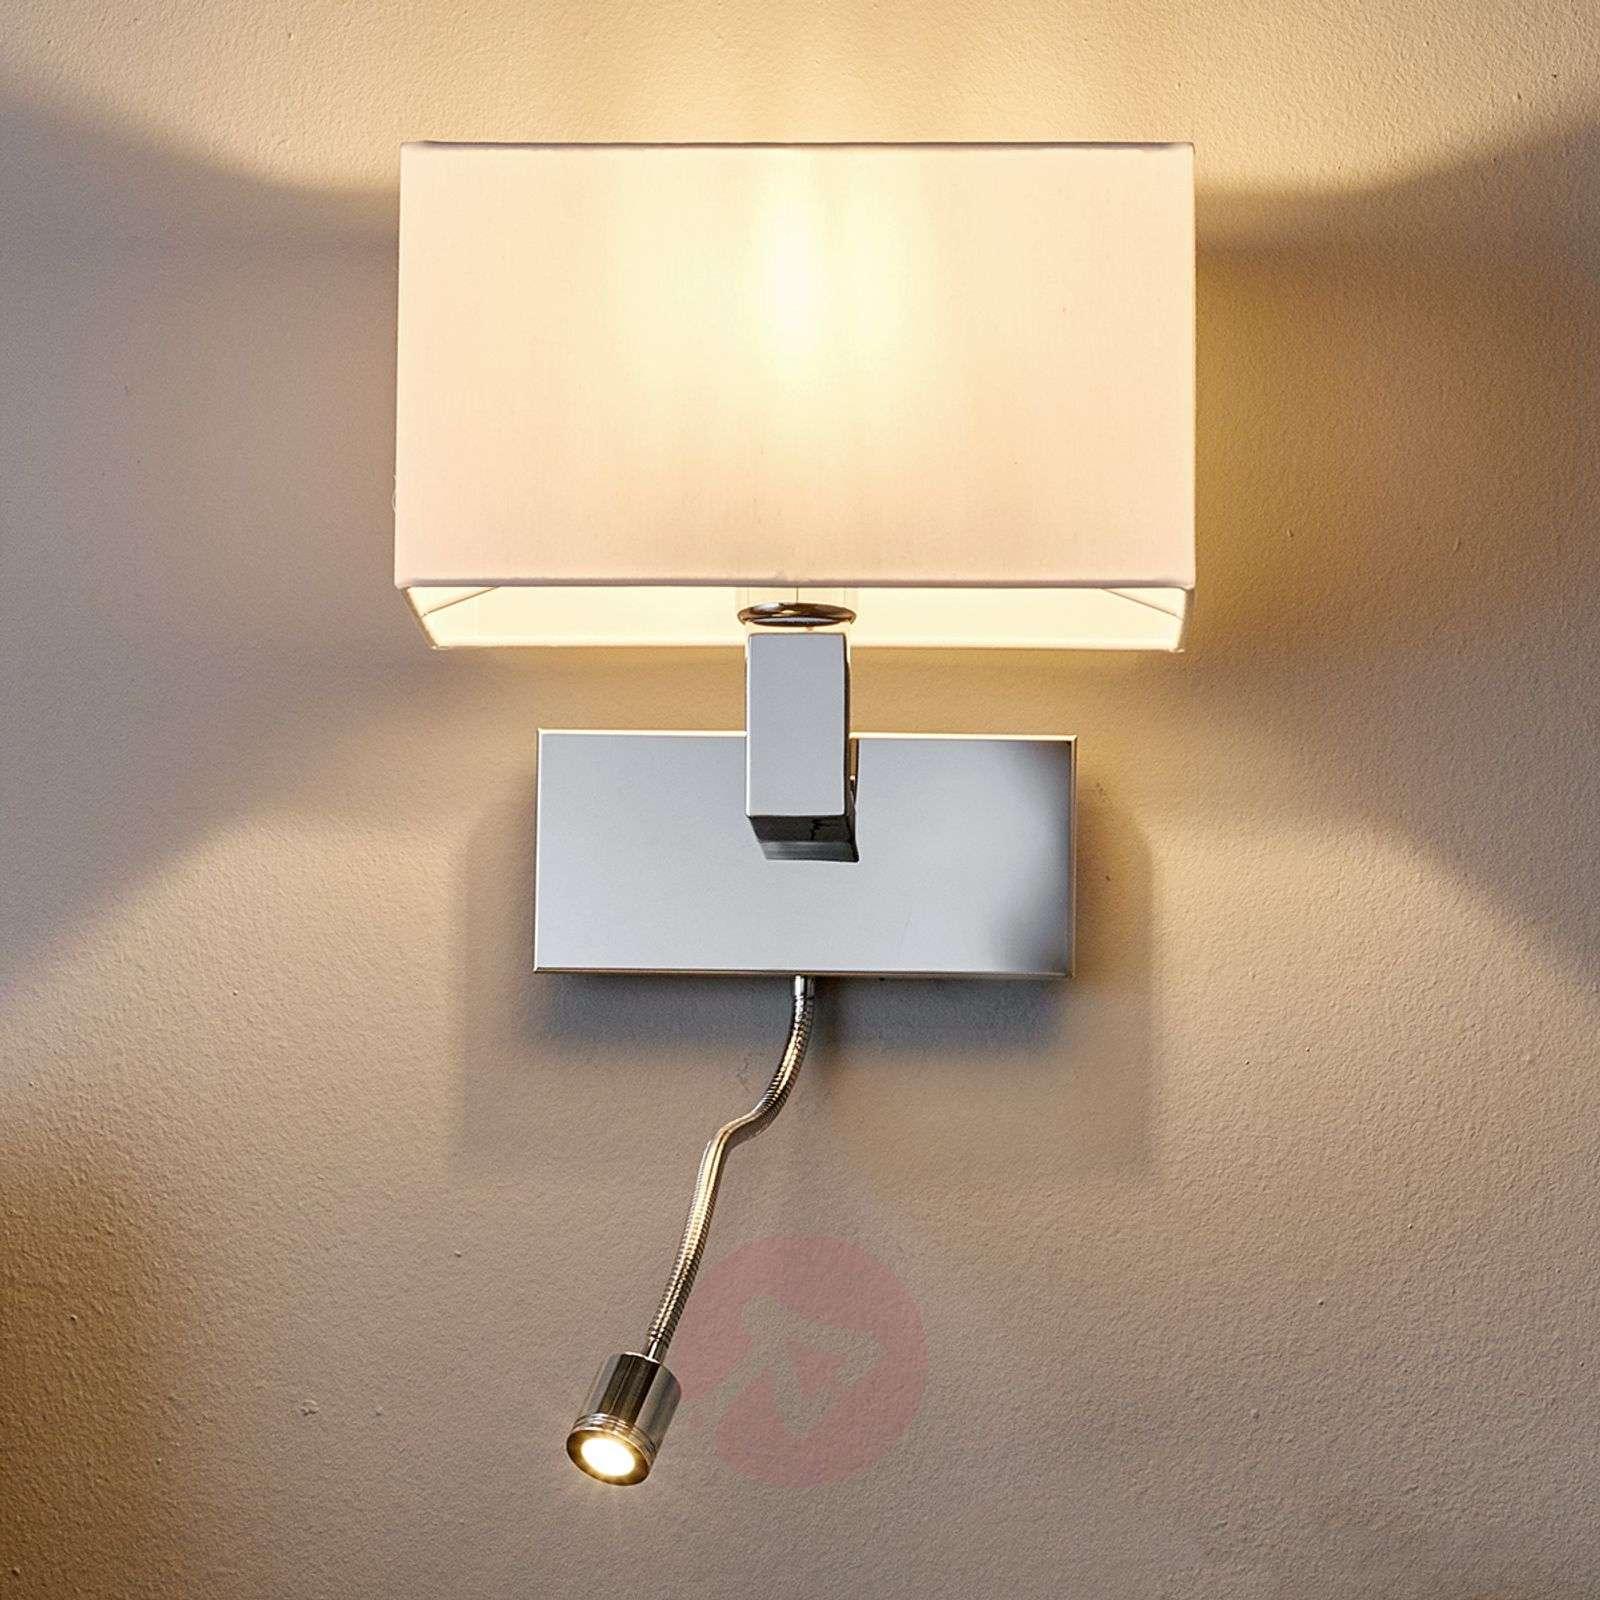 Wall light Tamara with fabric shade, LED flex arm-9976011-01